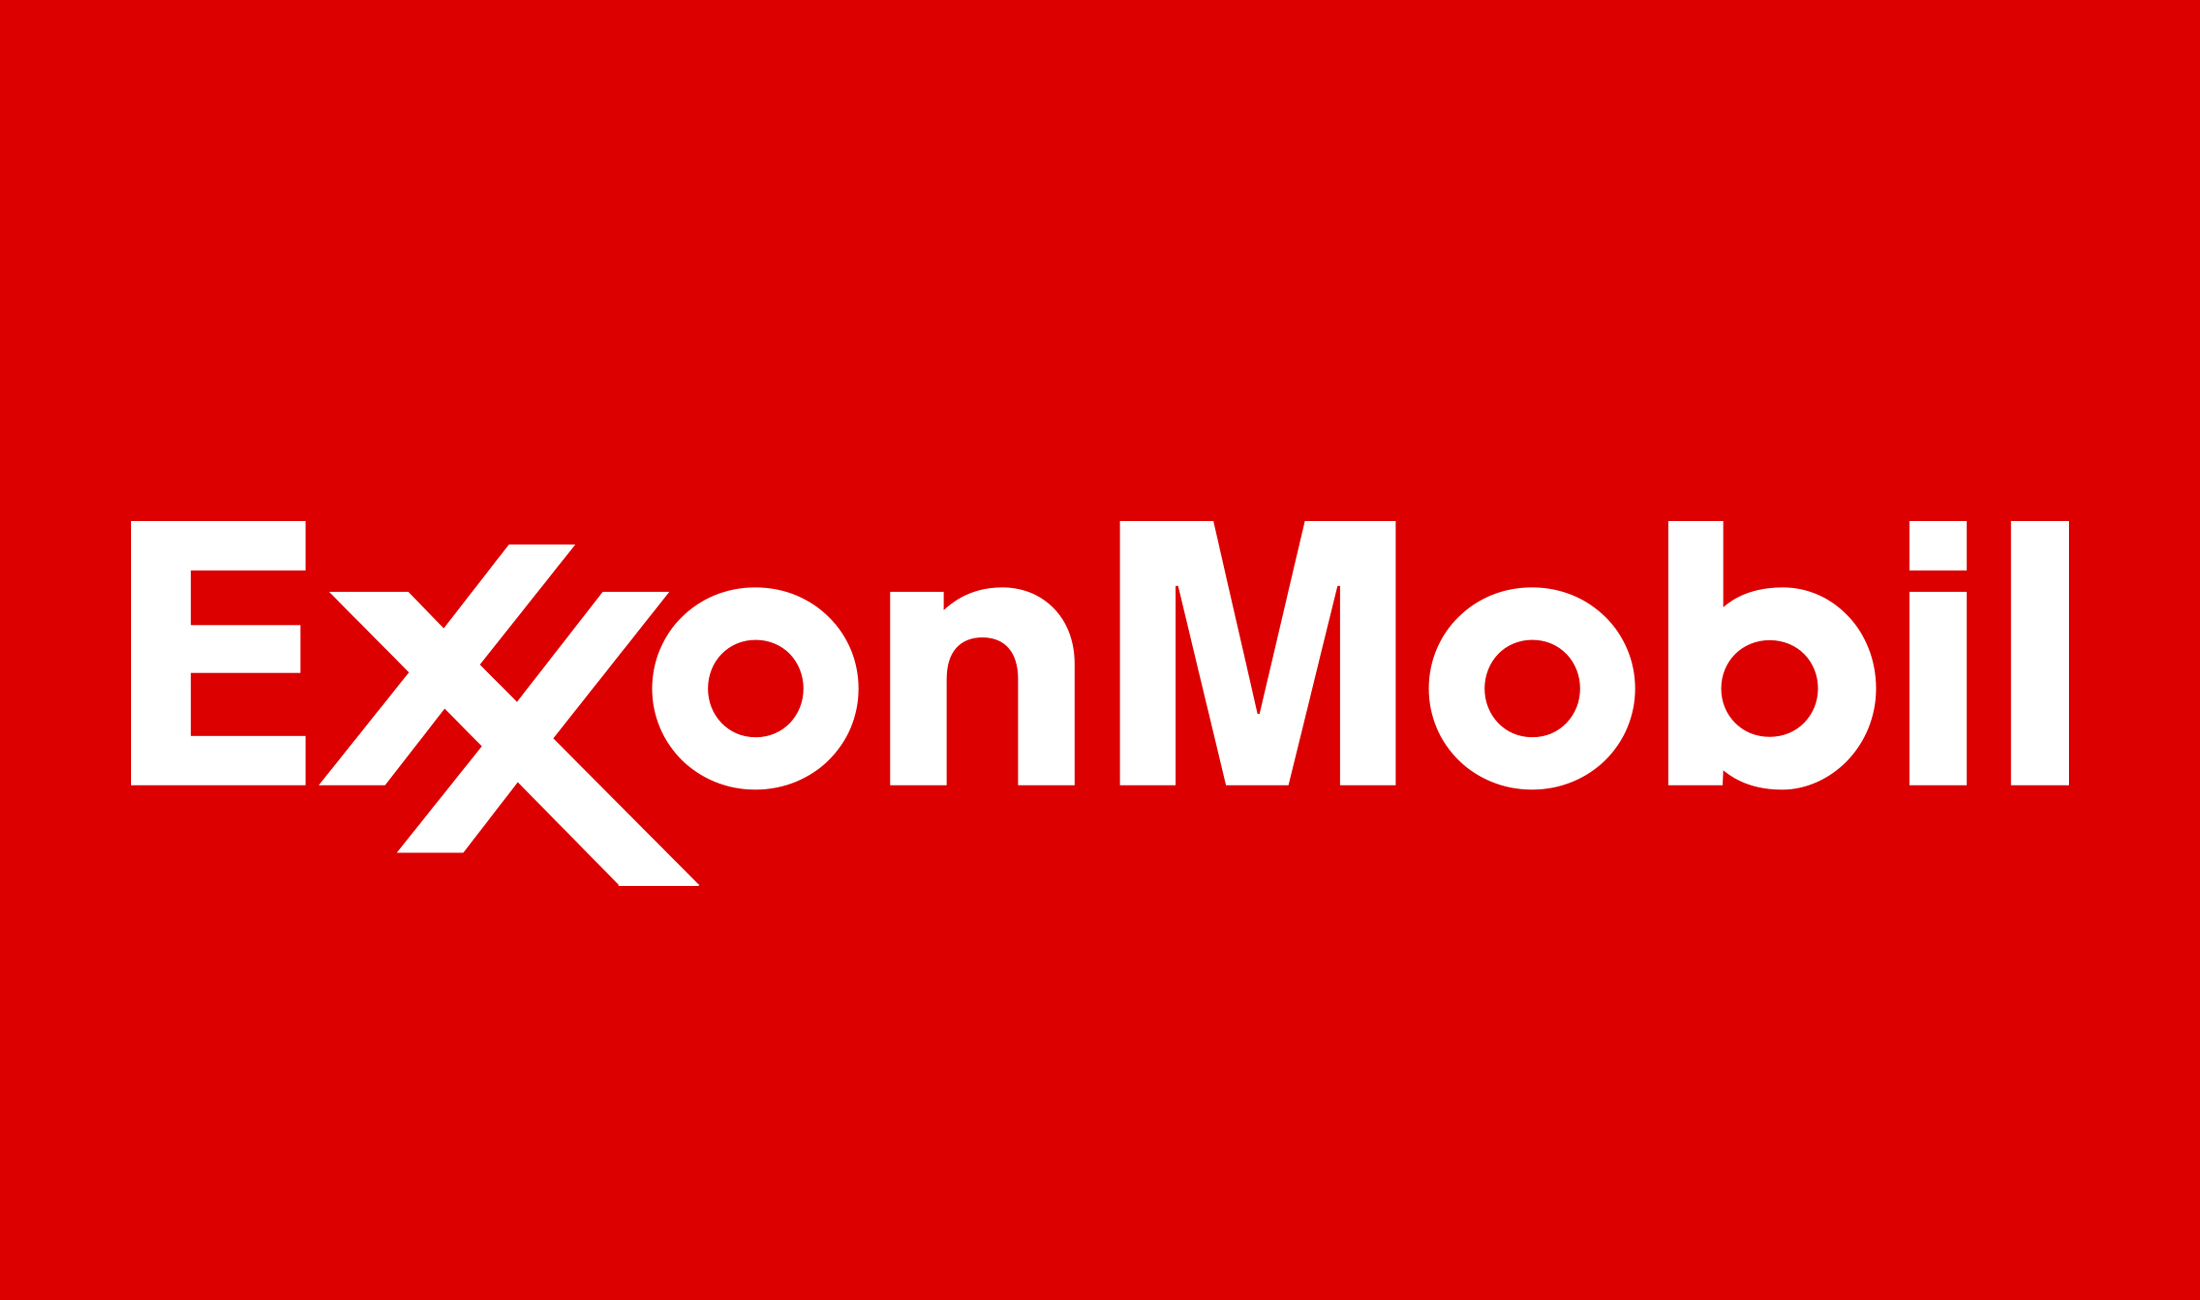 exxonmobil logo exxonmobil symbol meaning history and